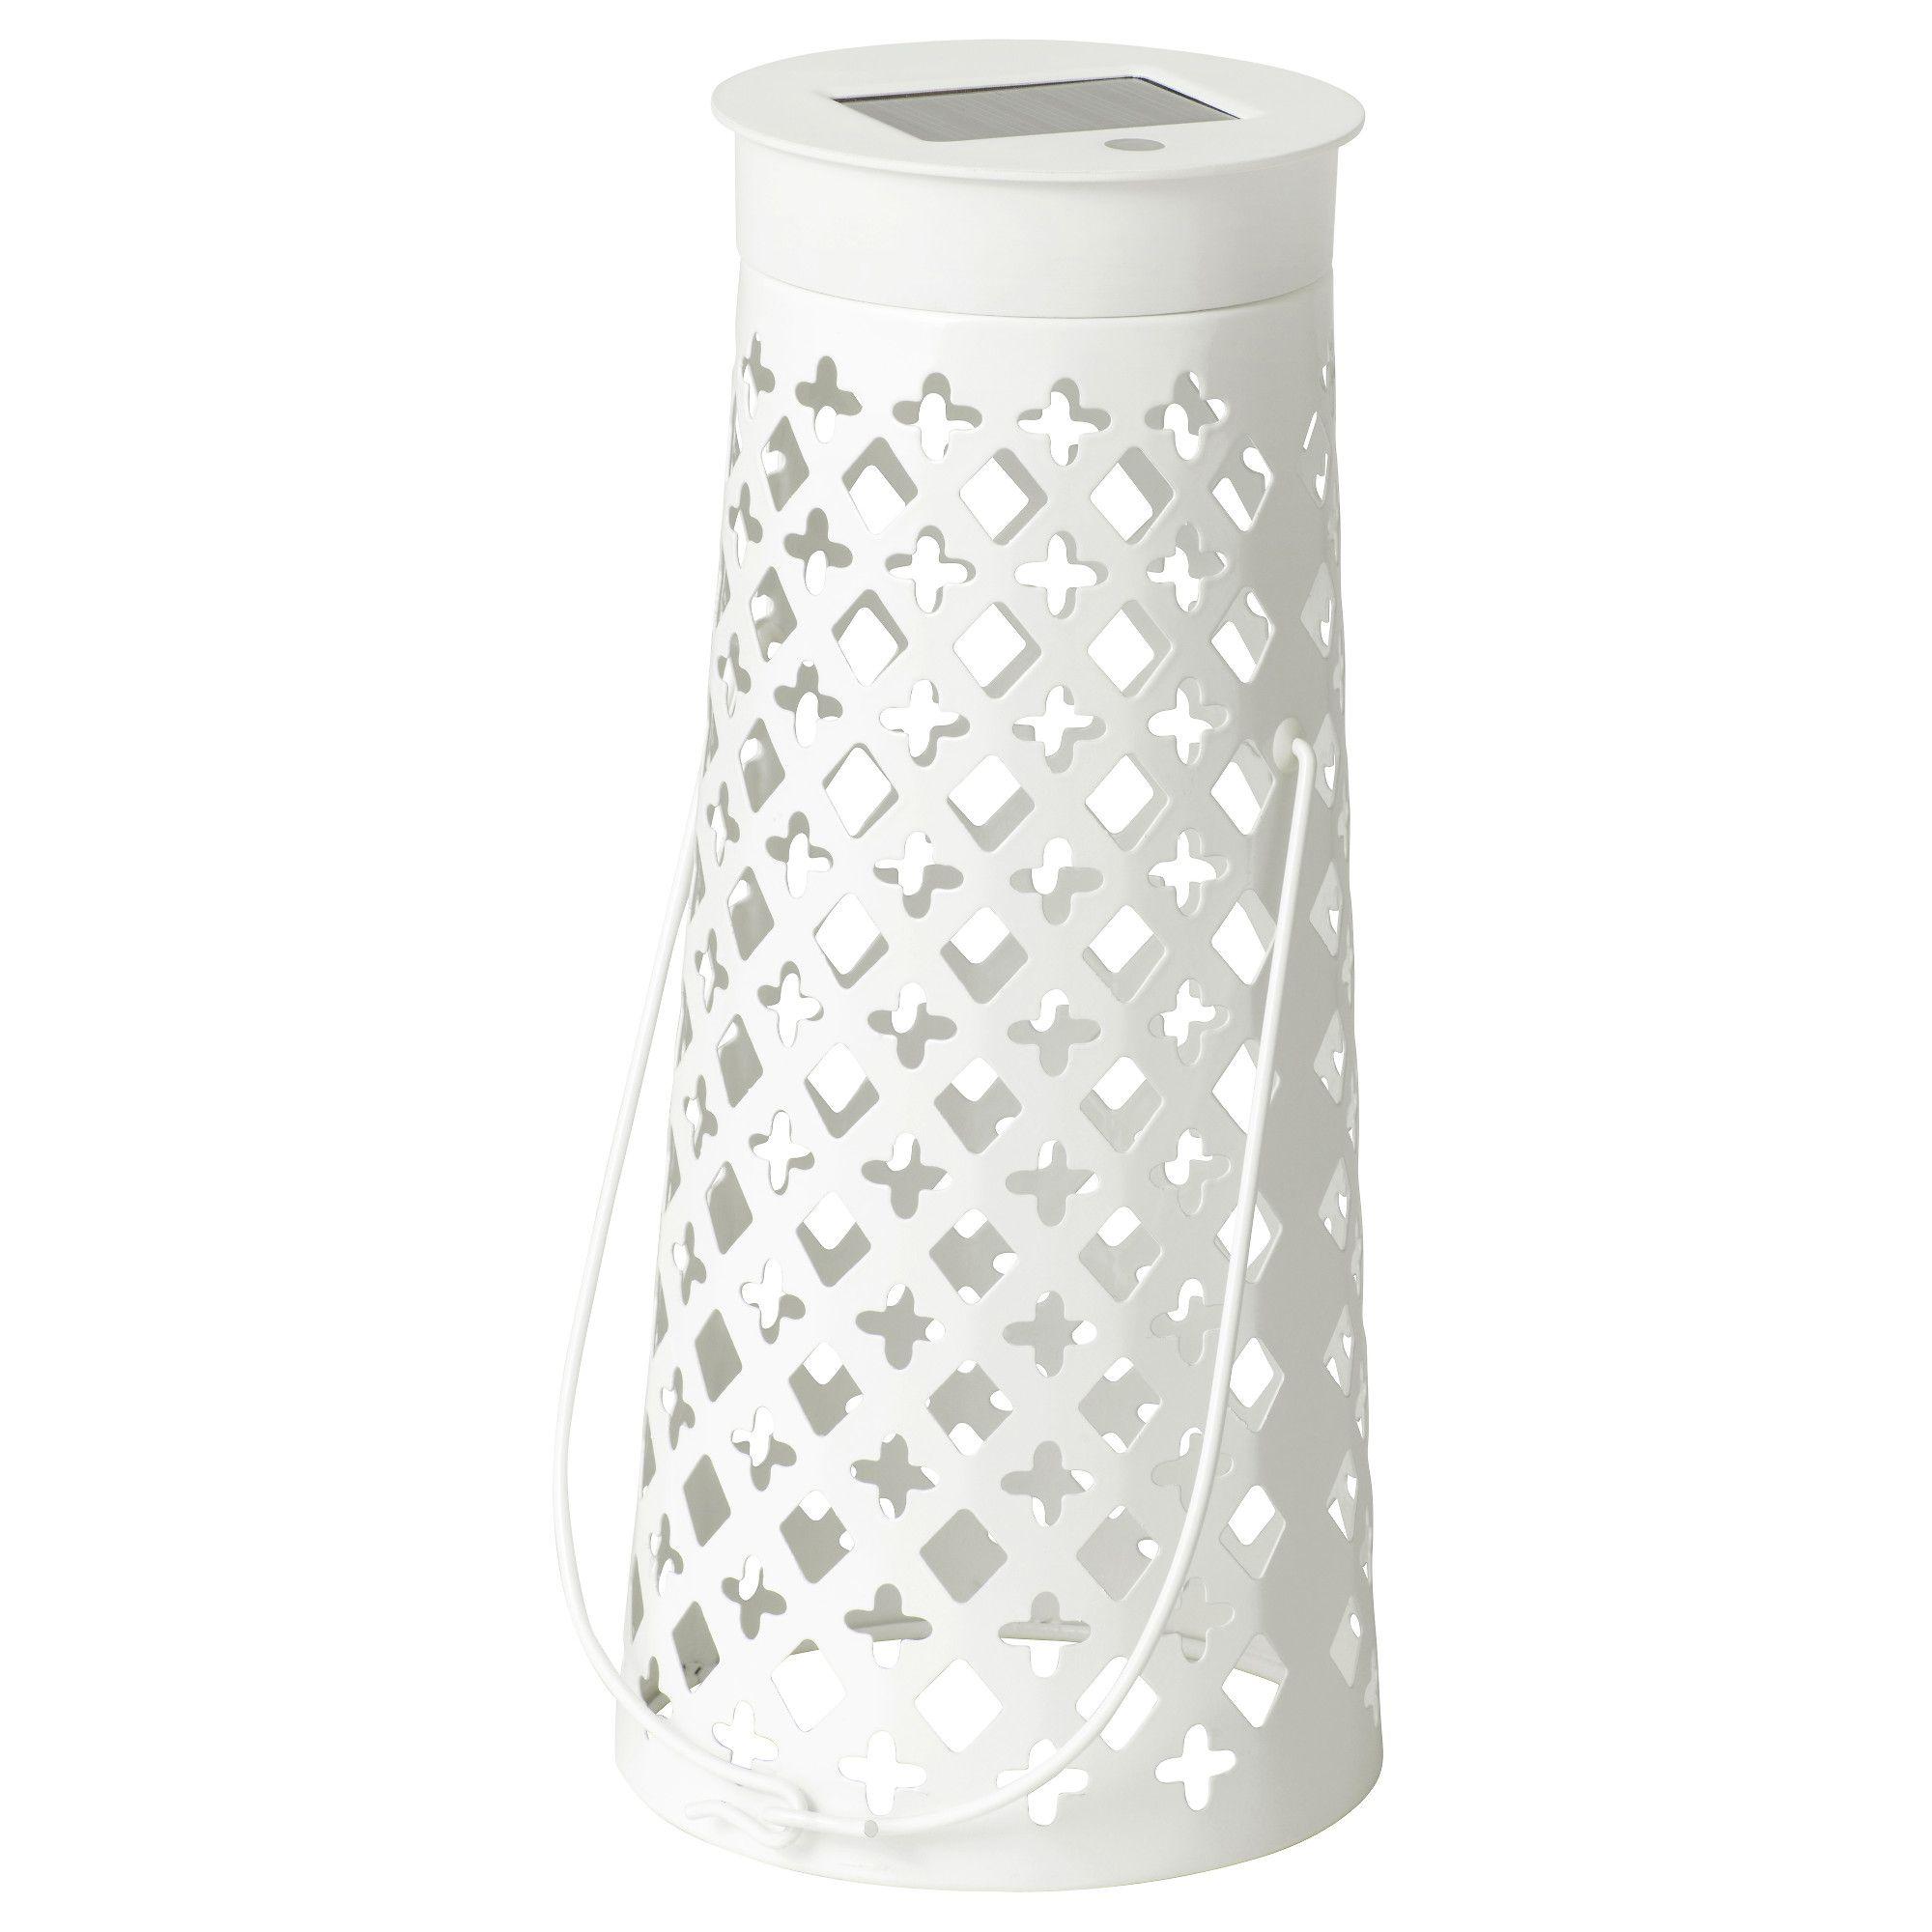 Ikea Solvinden Led Solar Powered Table Lamp Home Garden Ikea